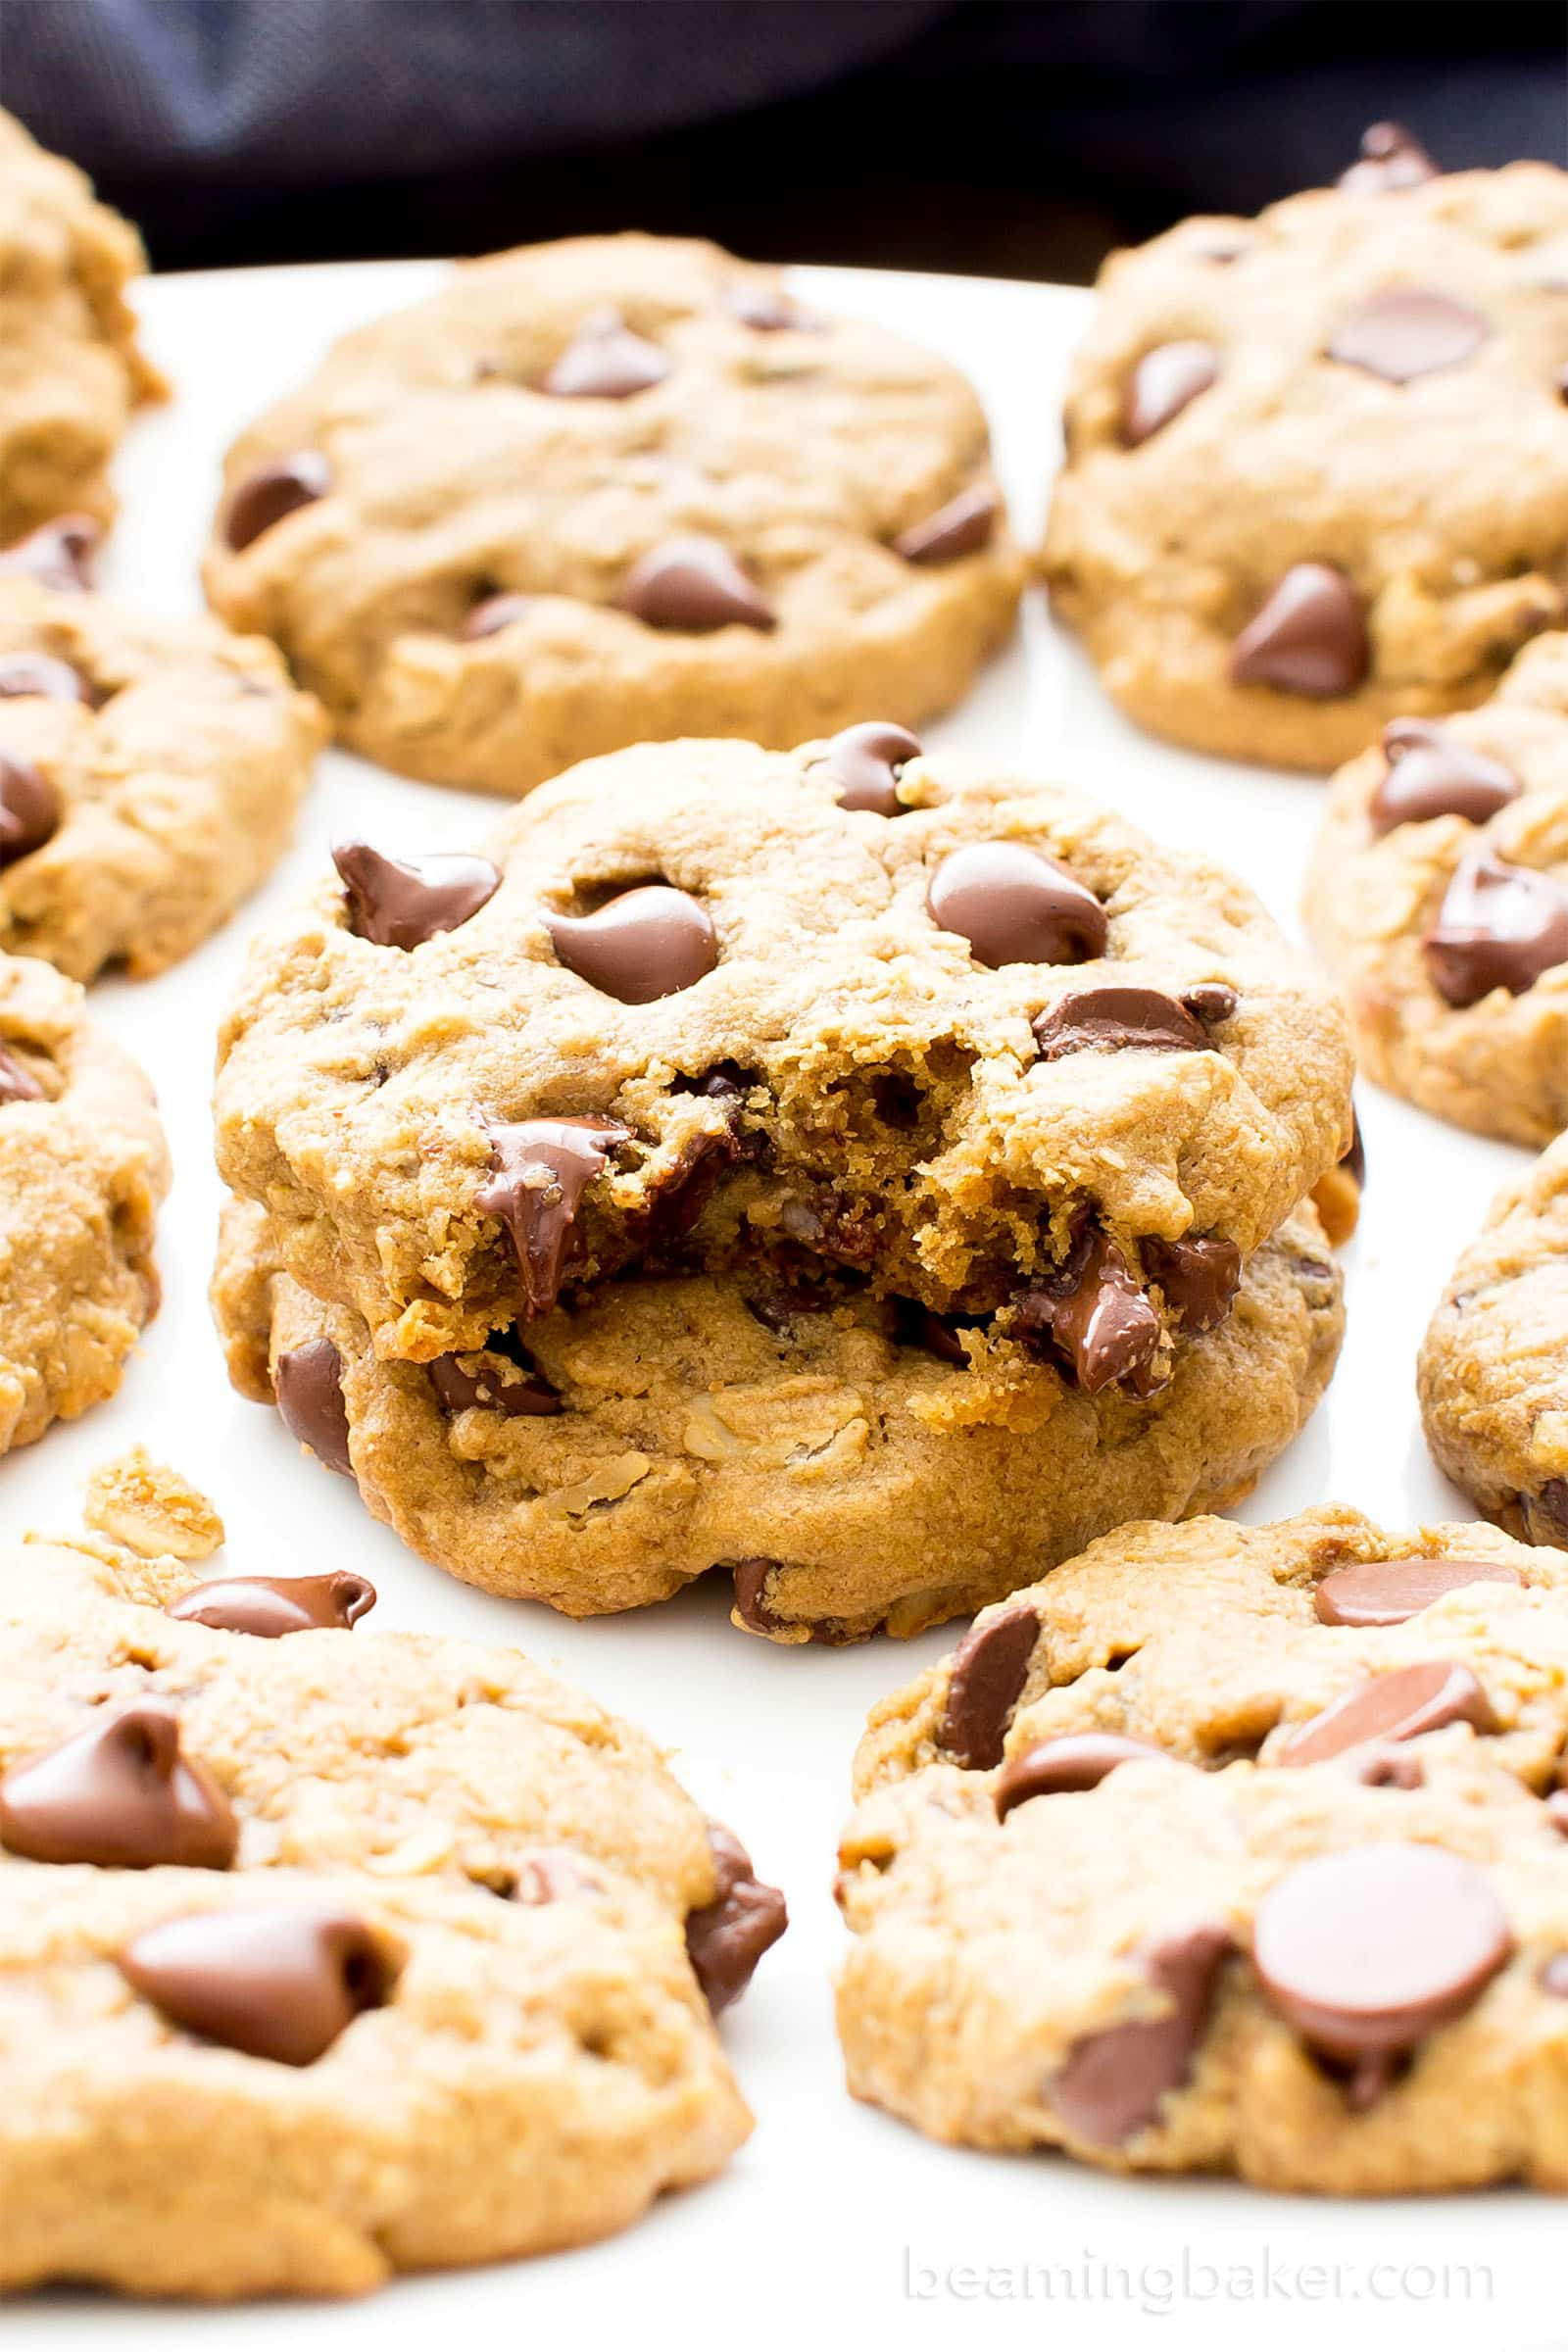 Gluten Free Dairy Free Oatmeal Cookies  Gluten Free Vegan Oat Flour Chocolate Chip Cookies V GF